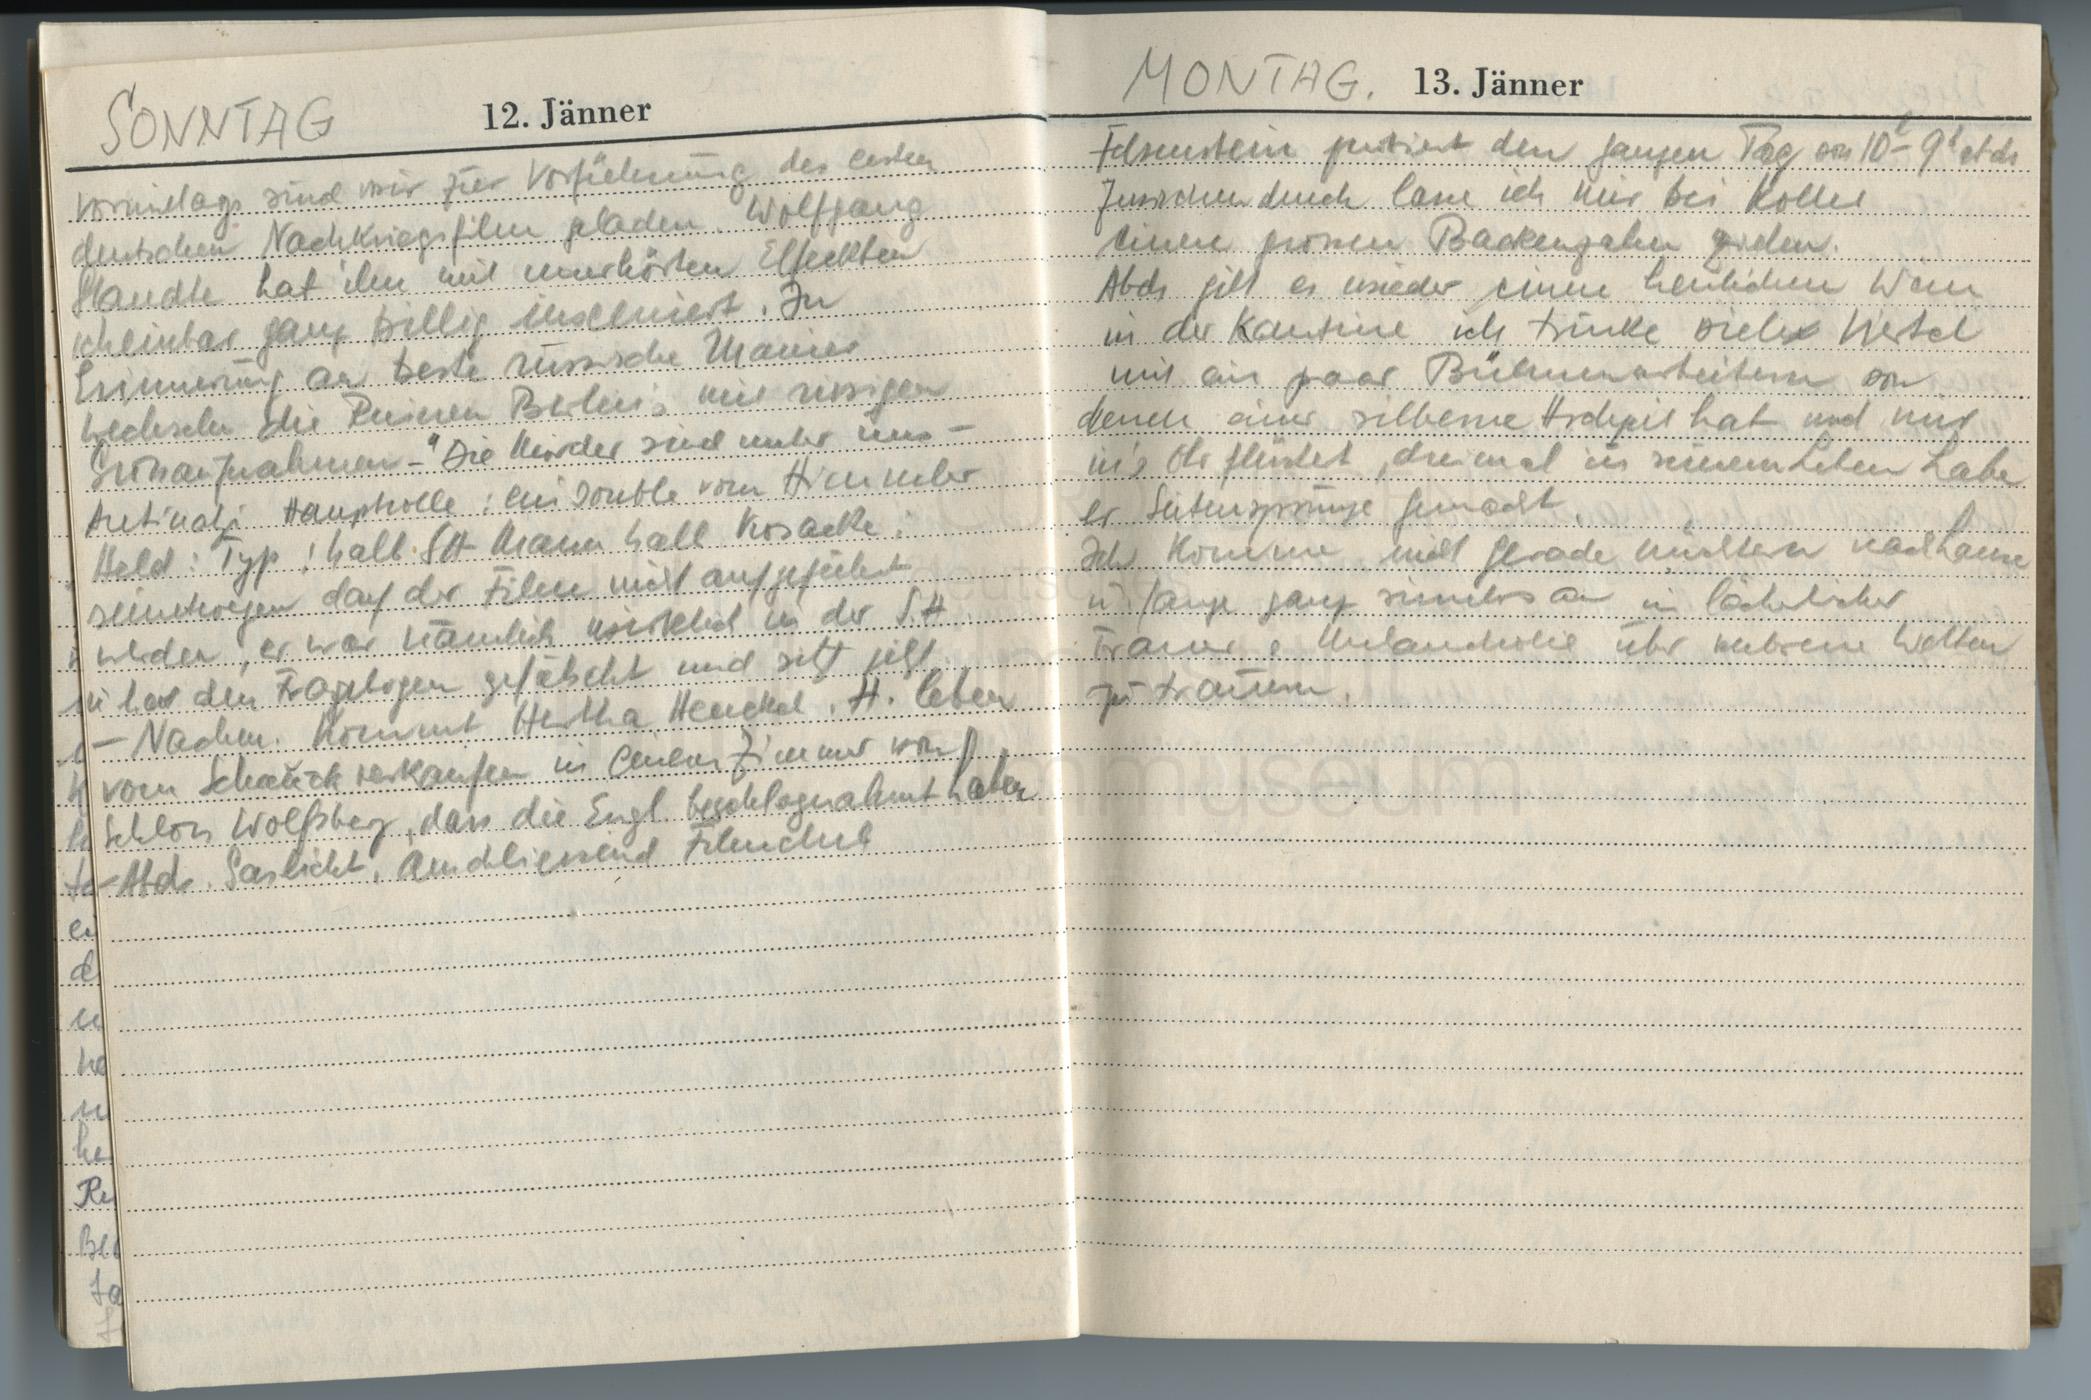 Tagebucheintrag vom 12.1.1947